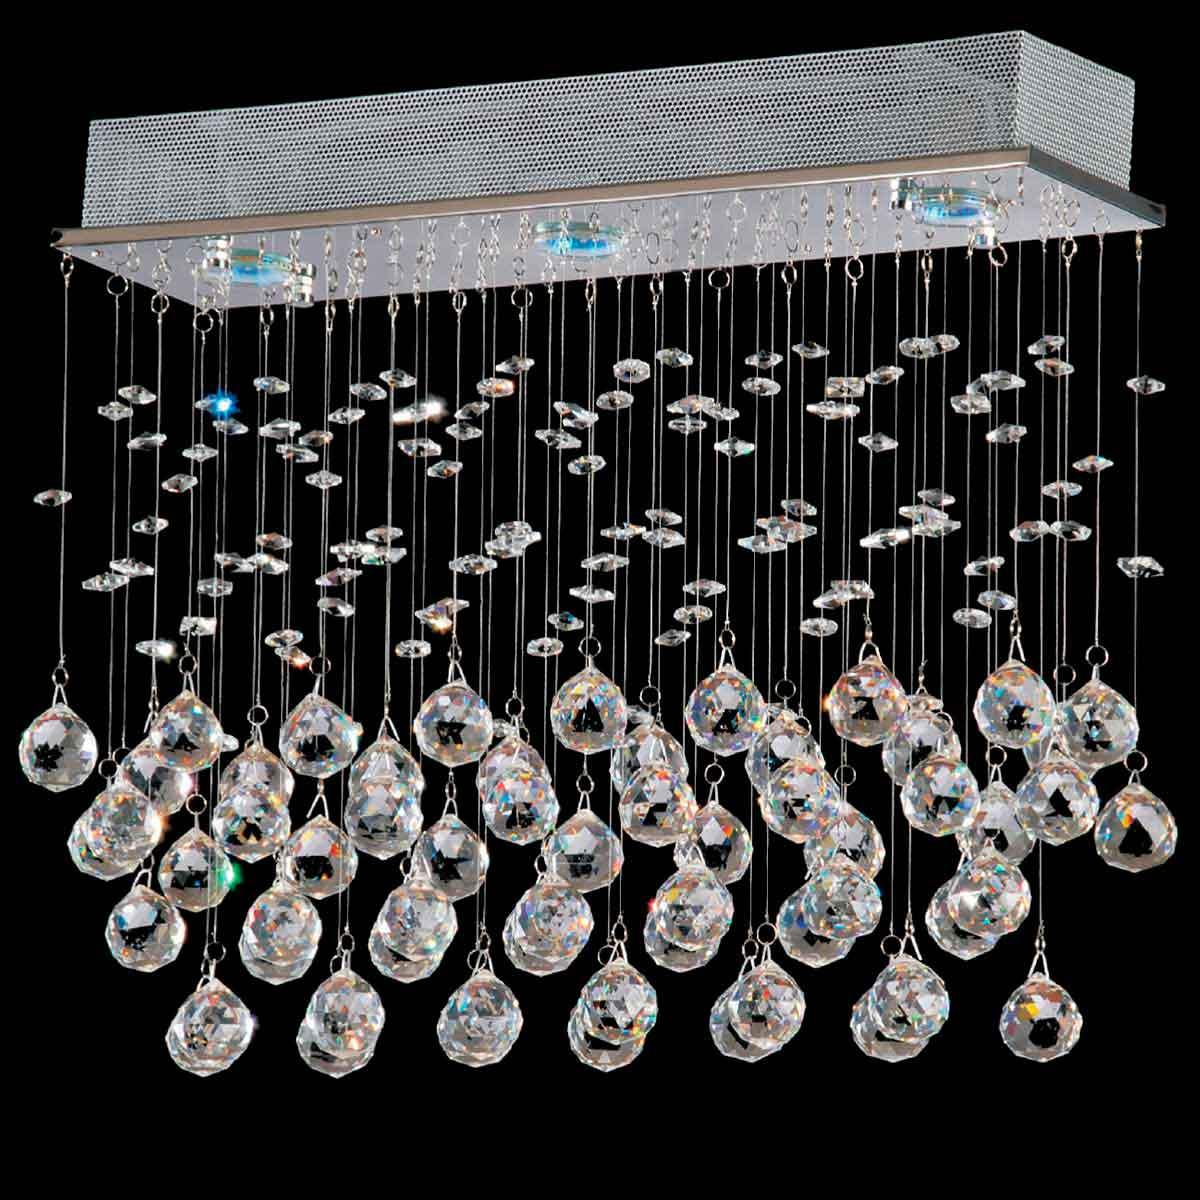 Pendente Star Cristal 42cm 3 Lamp. Gu10